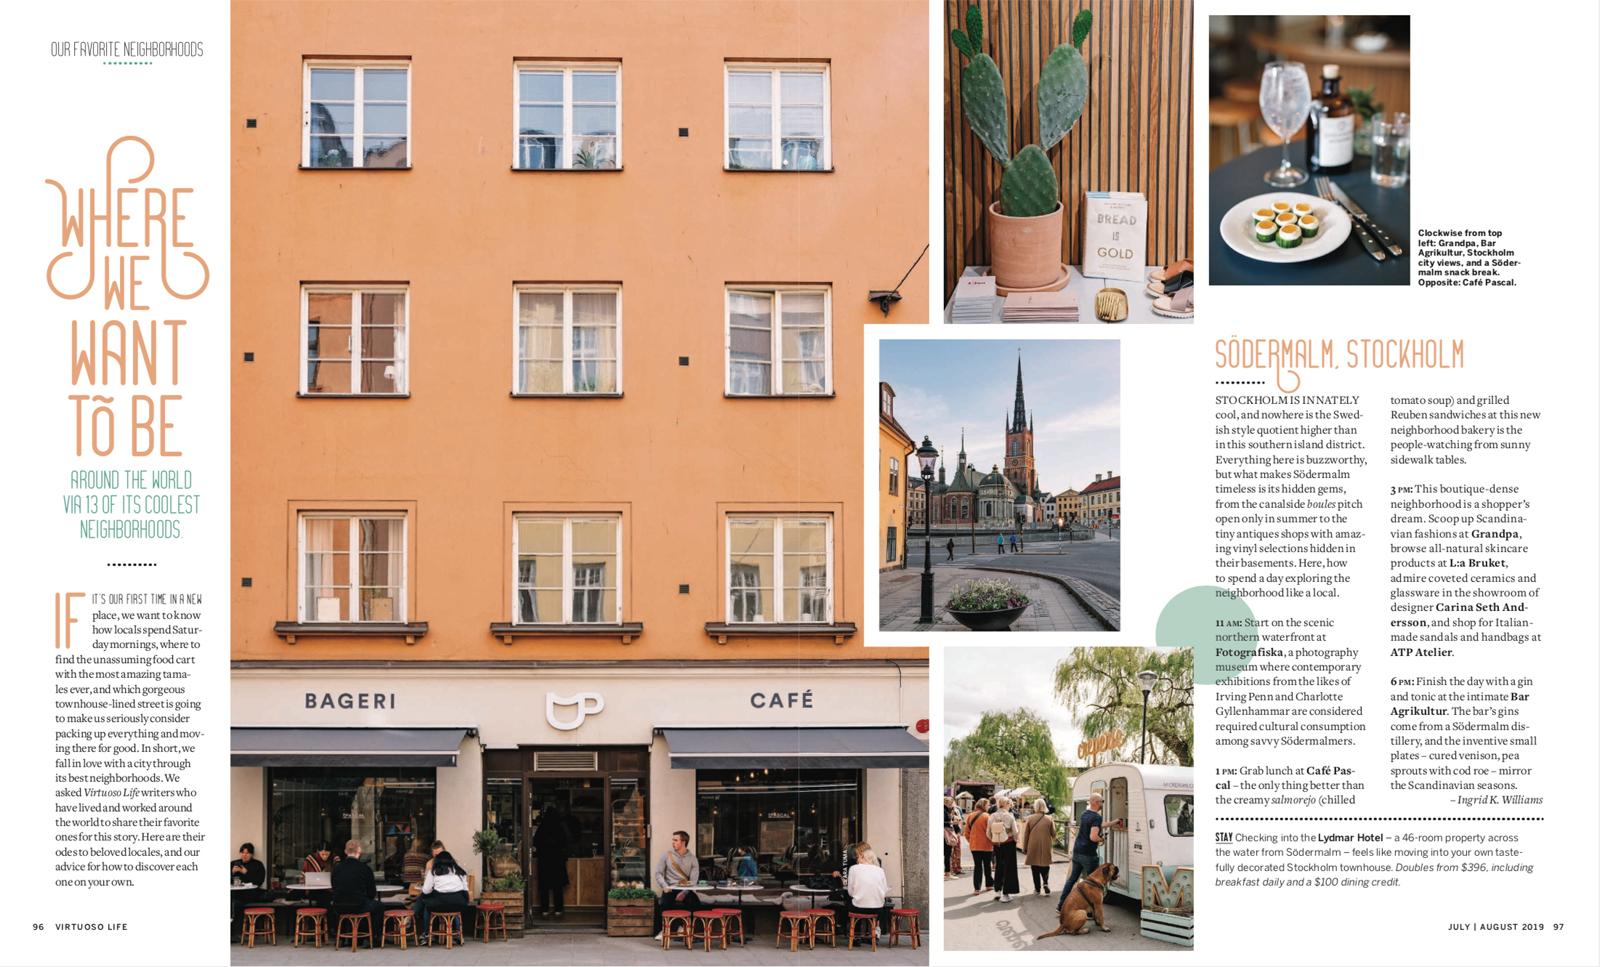 Stockholm neighborhood feature for Virtuoso Life magazine